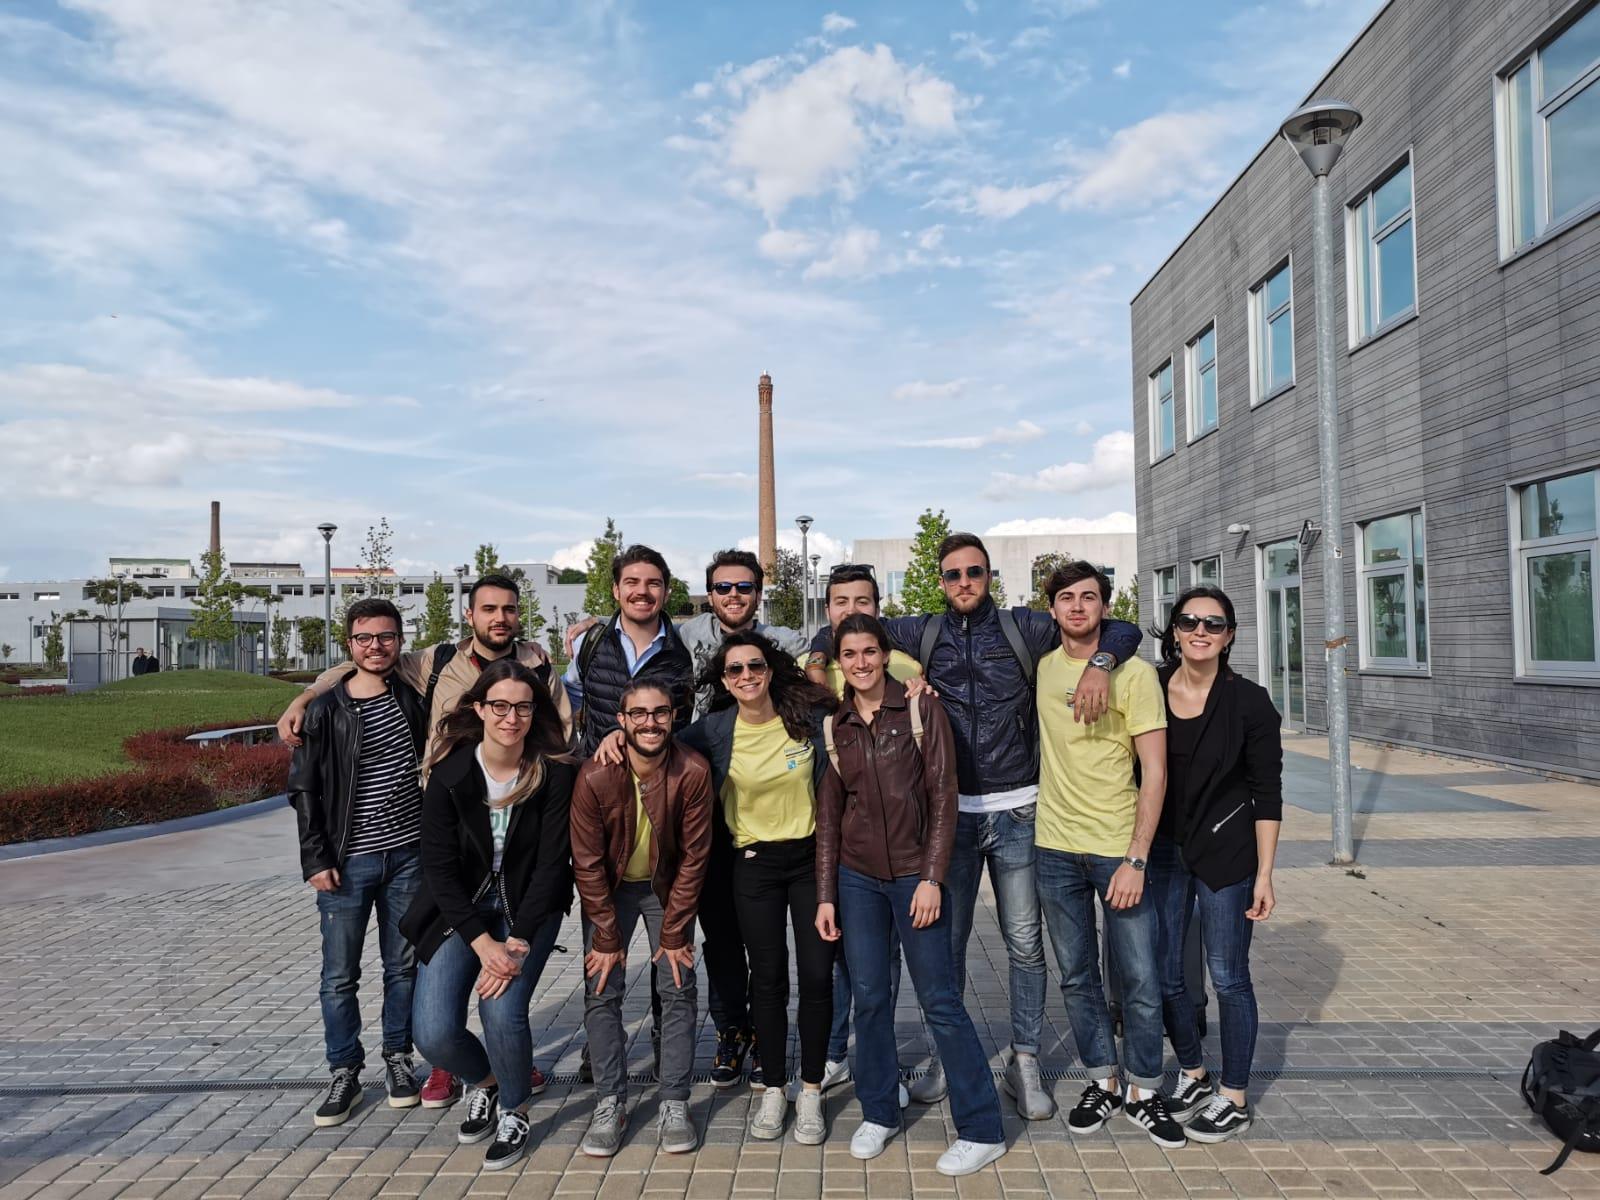 Idee d'impresa innovative: studenti Unipi sul podio a Napoli